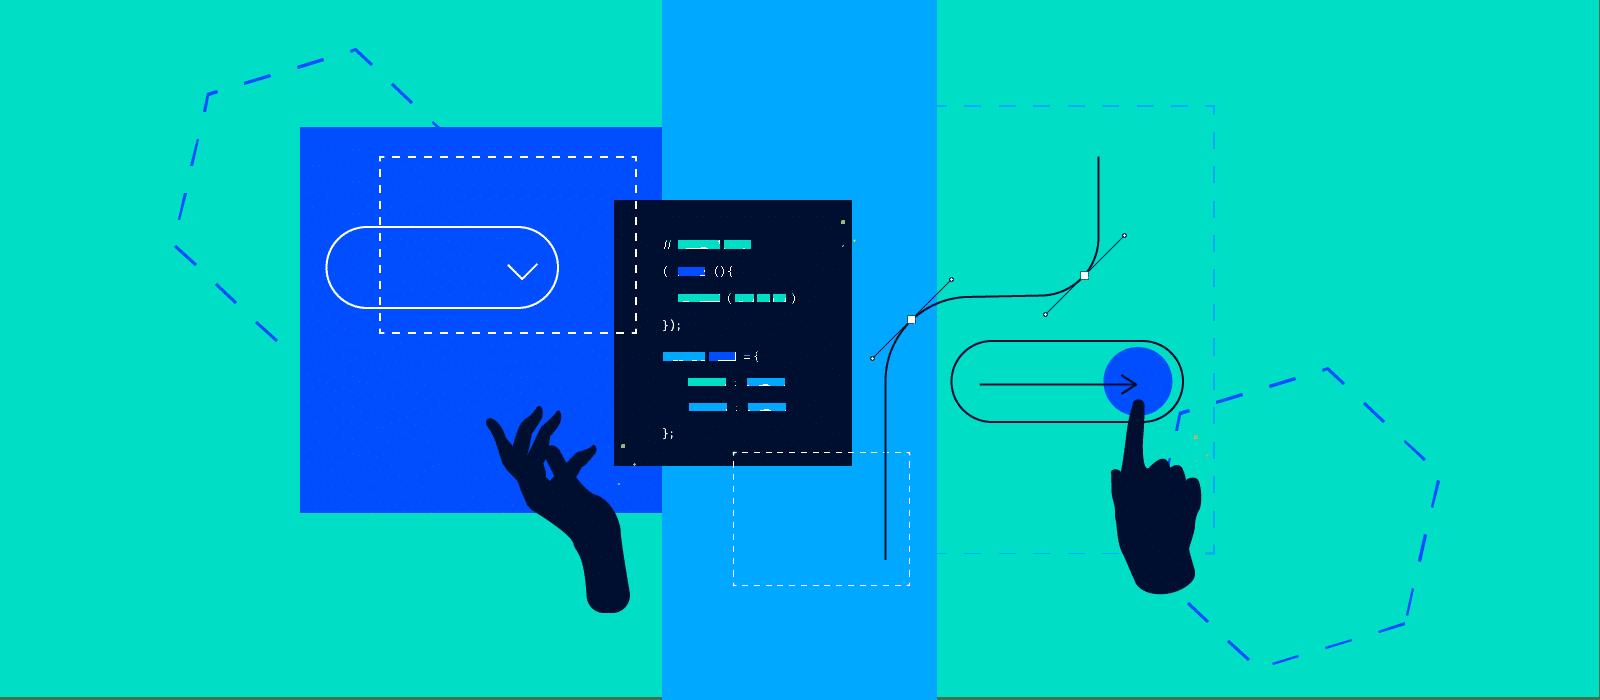 تجربه کاربری (UX) و نرخ پرش